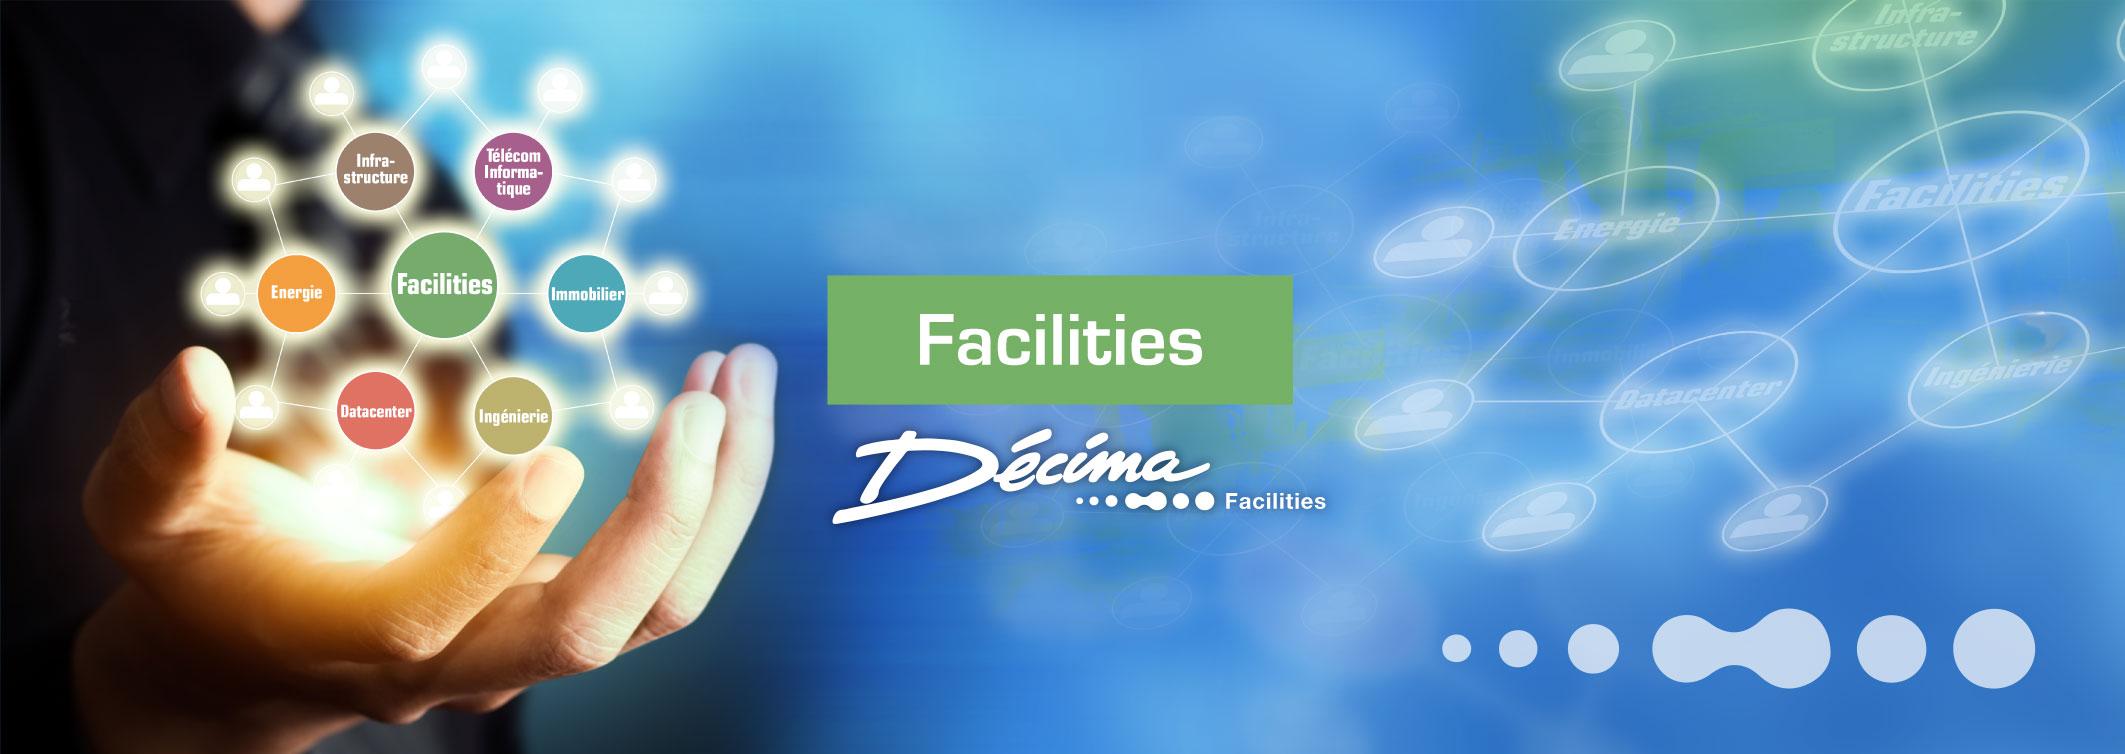 slide_facilities